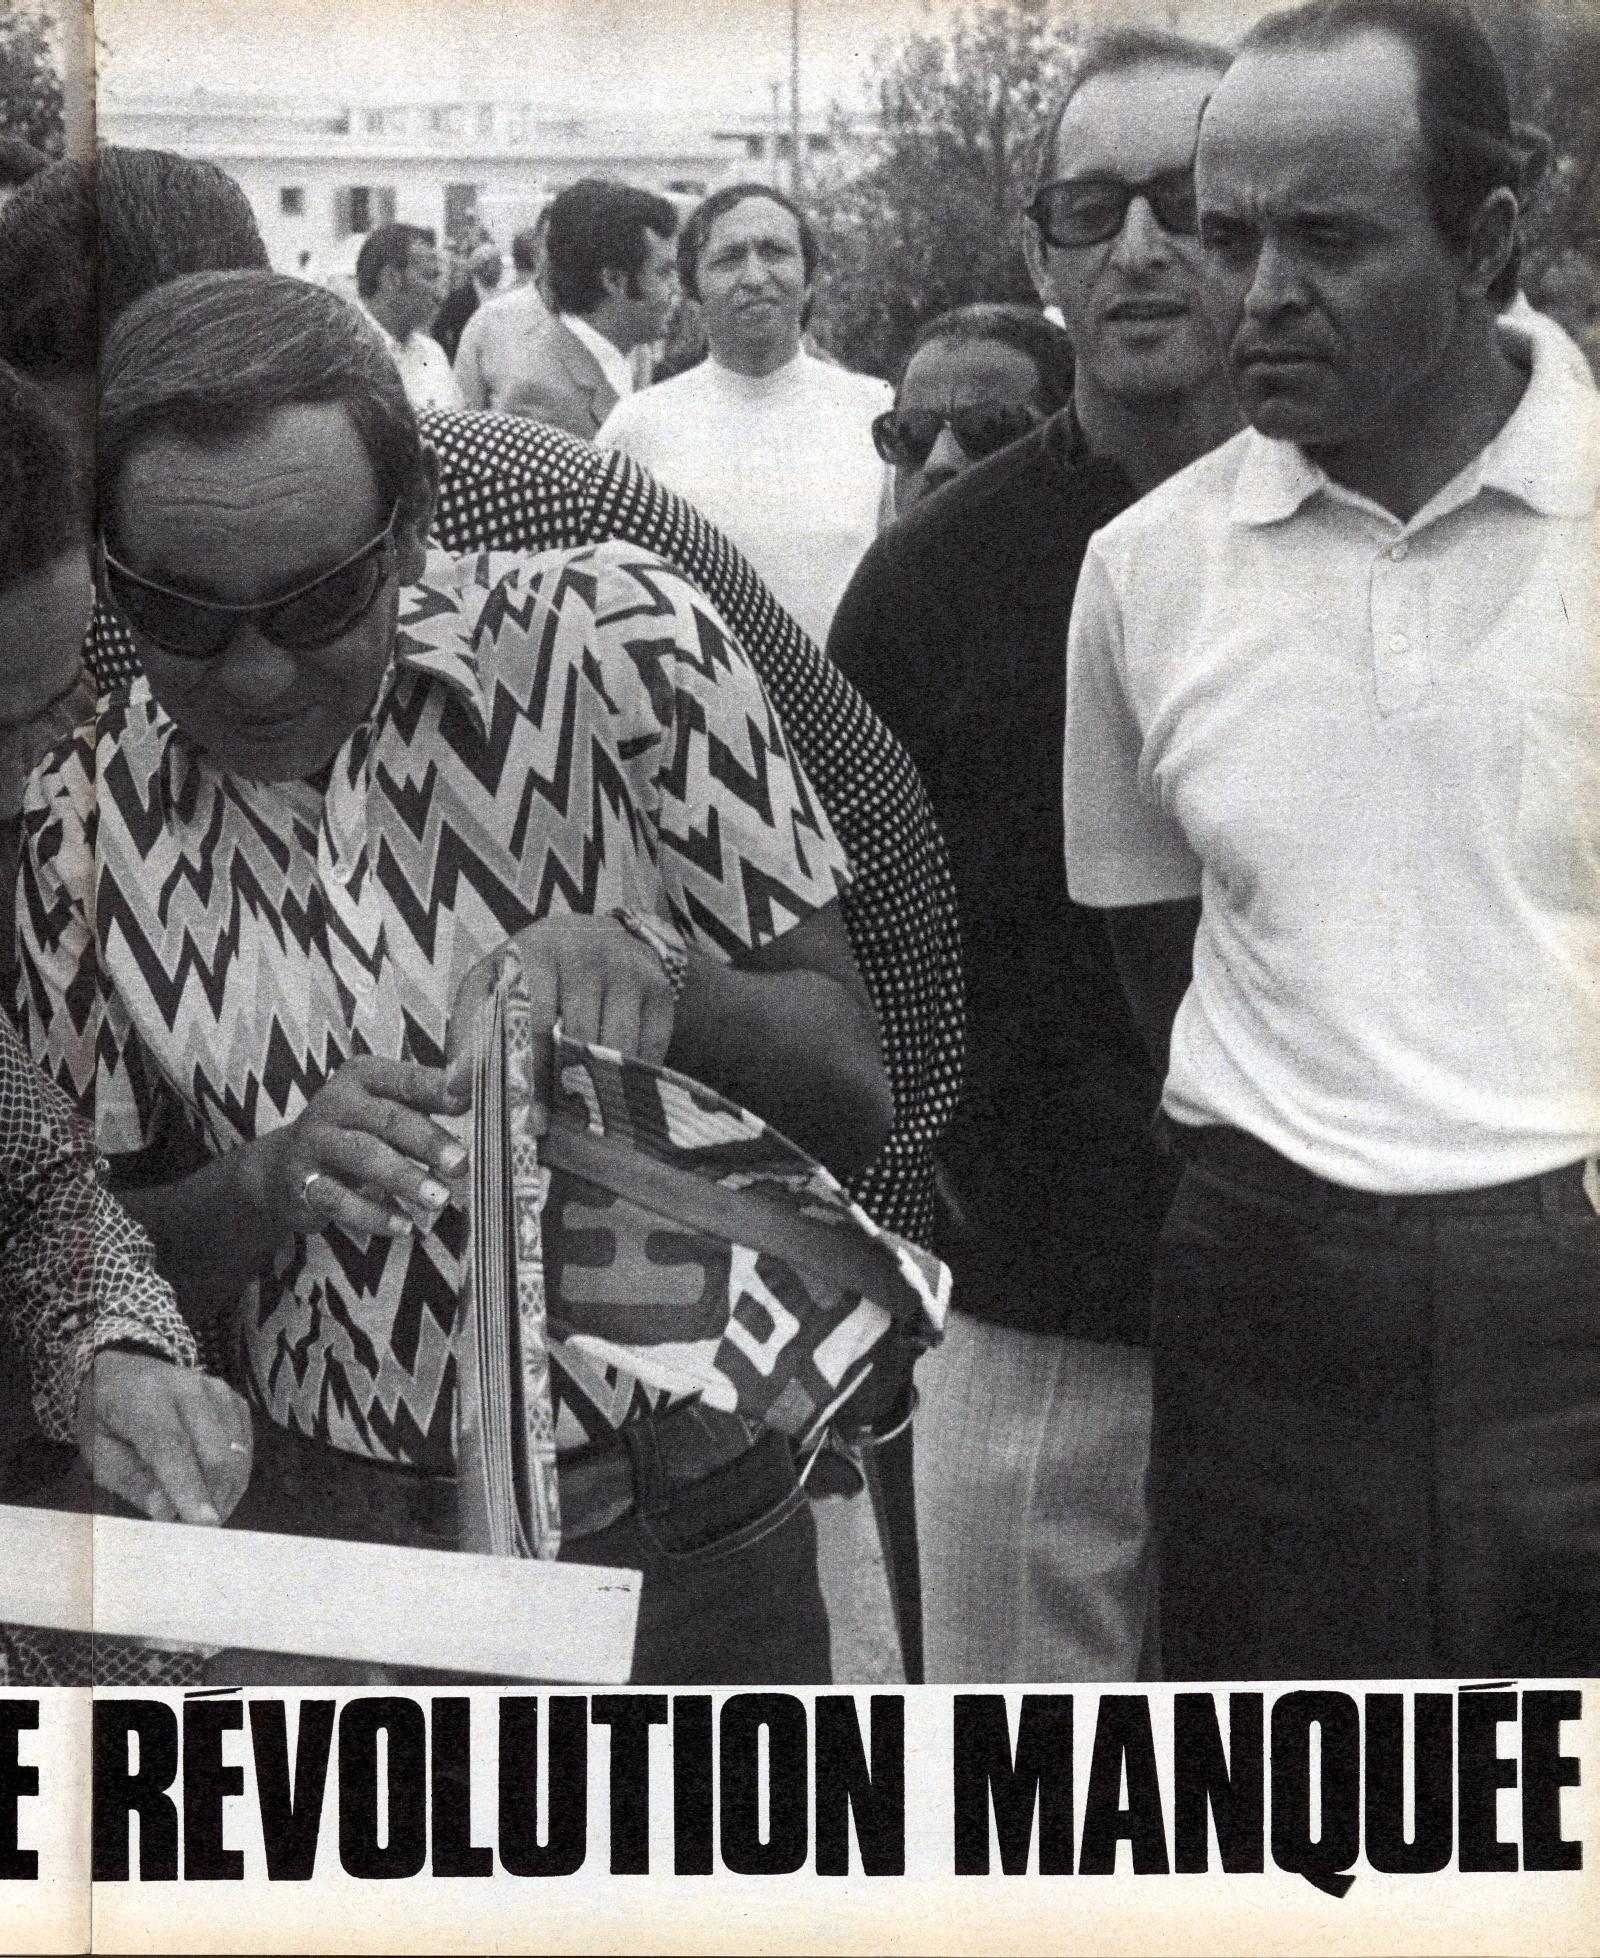 Tentative de coup d'État à Rabat et Skhirate le 10 juillet 1971  48695650431_5c5e66e1d0_o